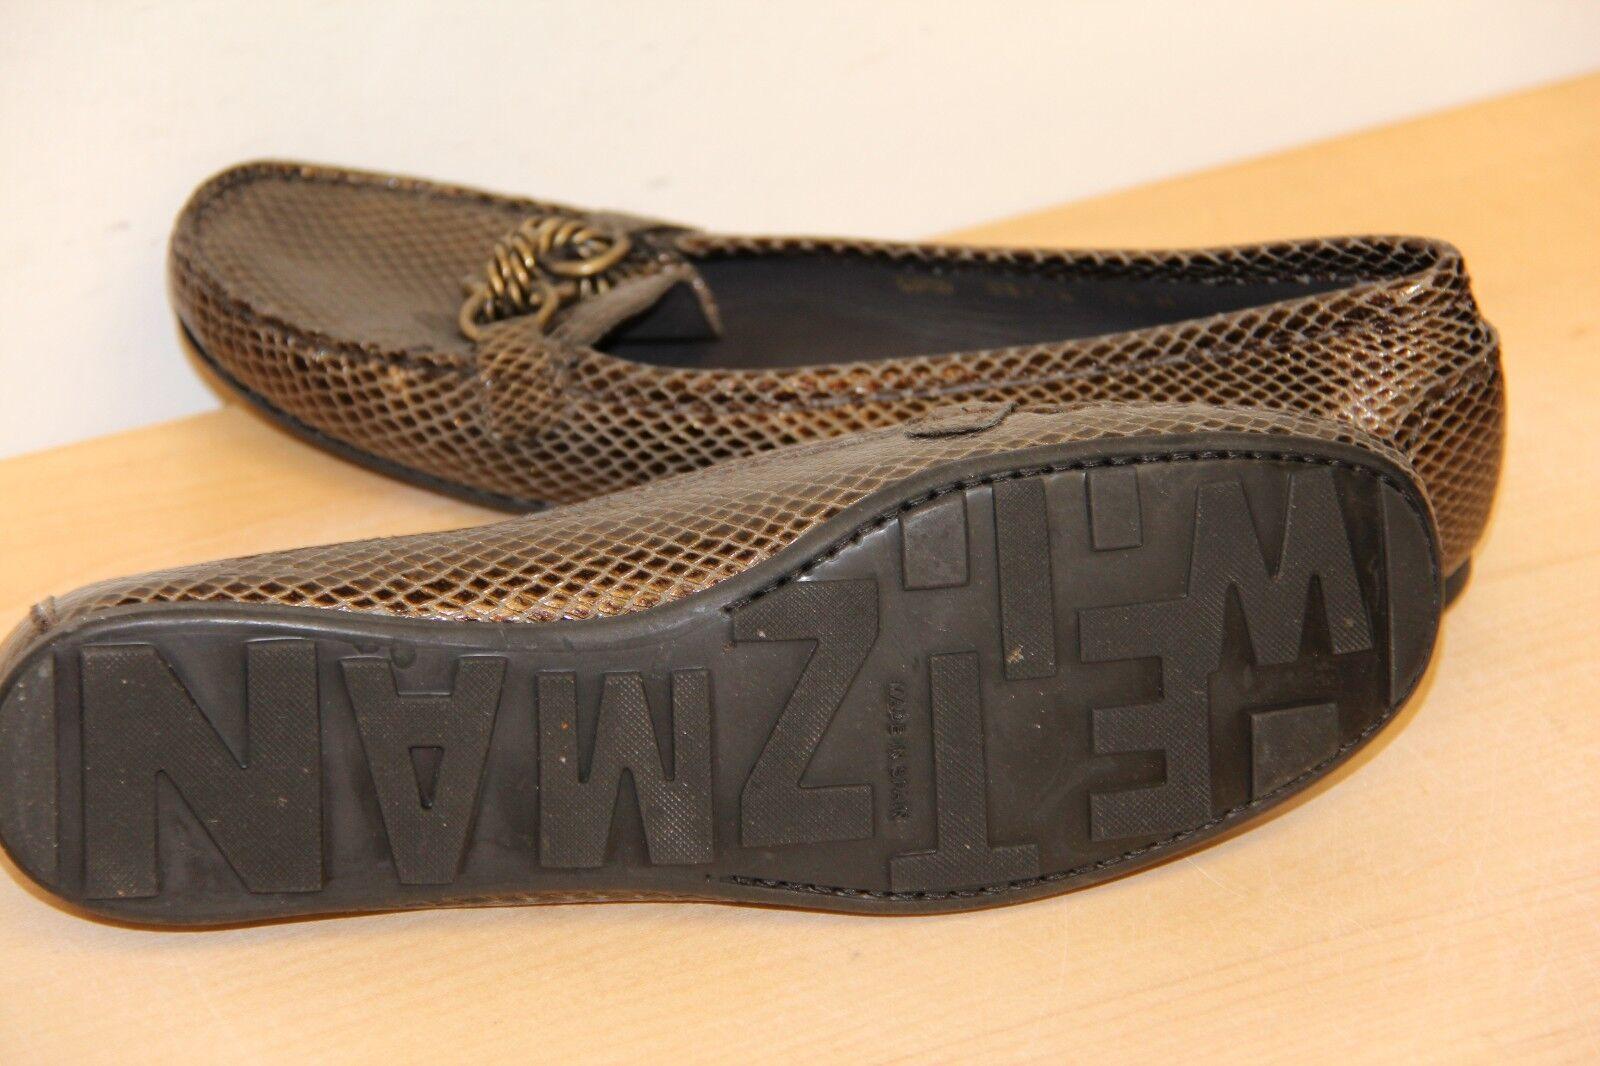 NIB Stuart Weitzman 7.5 FUELCHAIN Rootbeer Cobrette Loafers Schuhes sz 7.5 Weitzman f29b07